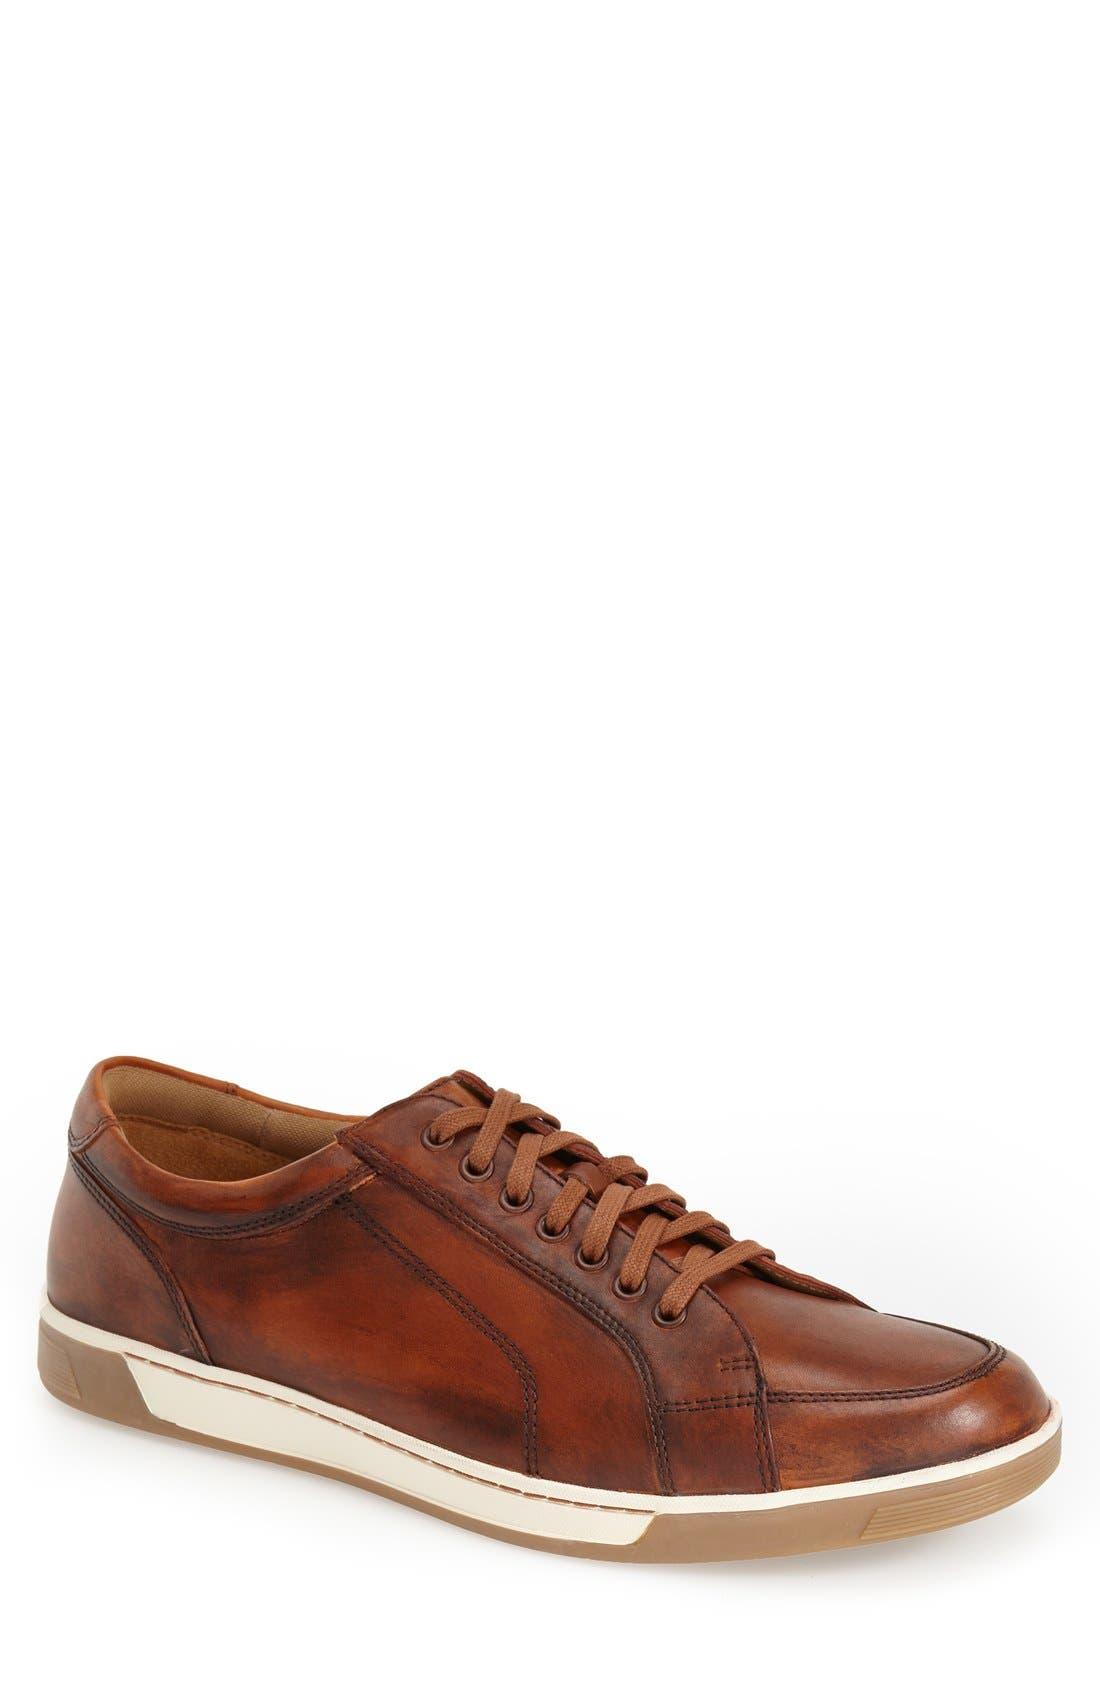 Main Image - Cole Haan 'Vartan Sport Oxford' Sneaker (Men)